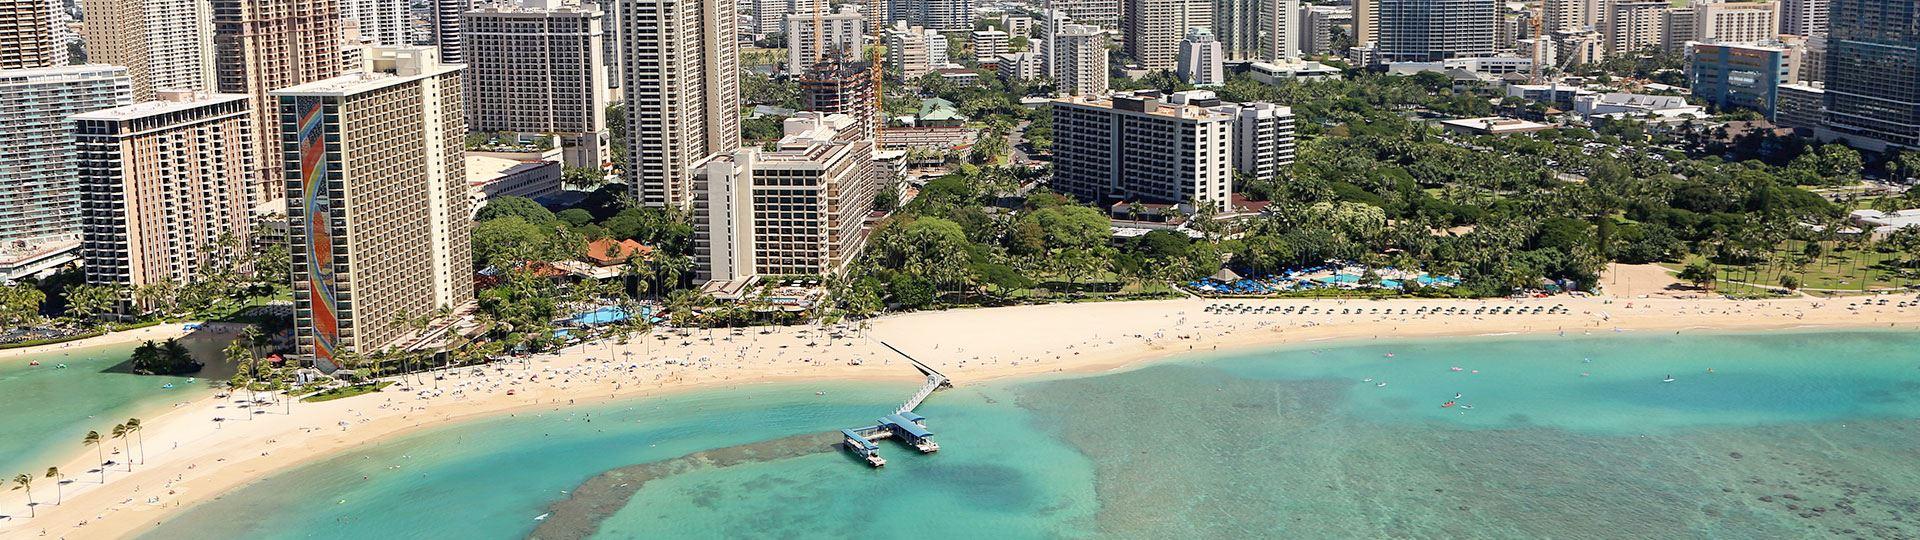 Things at Honolulu, Hawaii Hotel